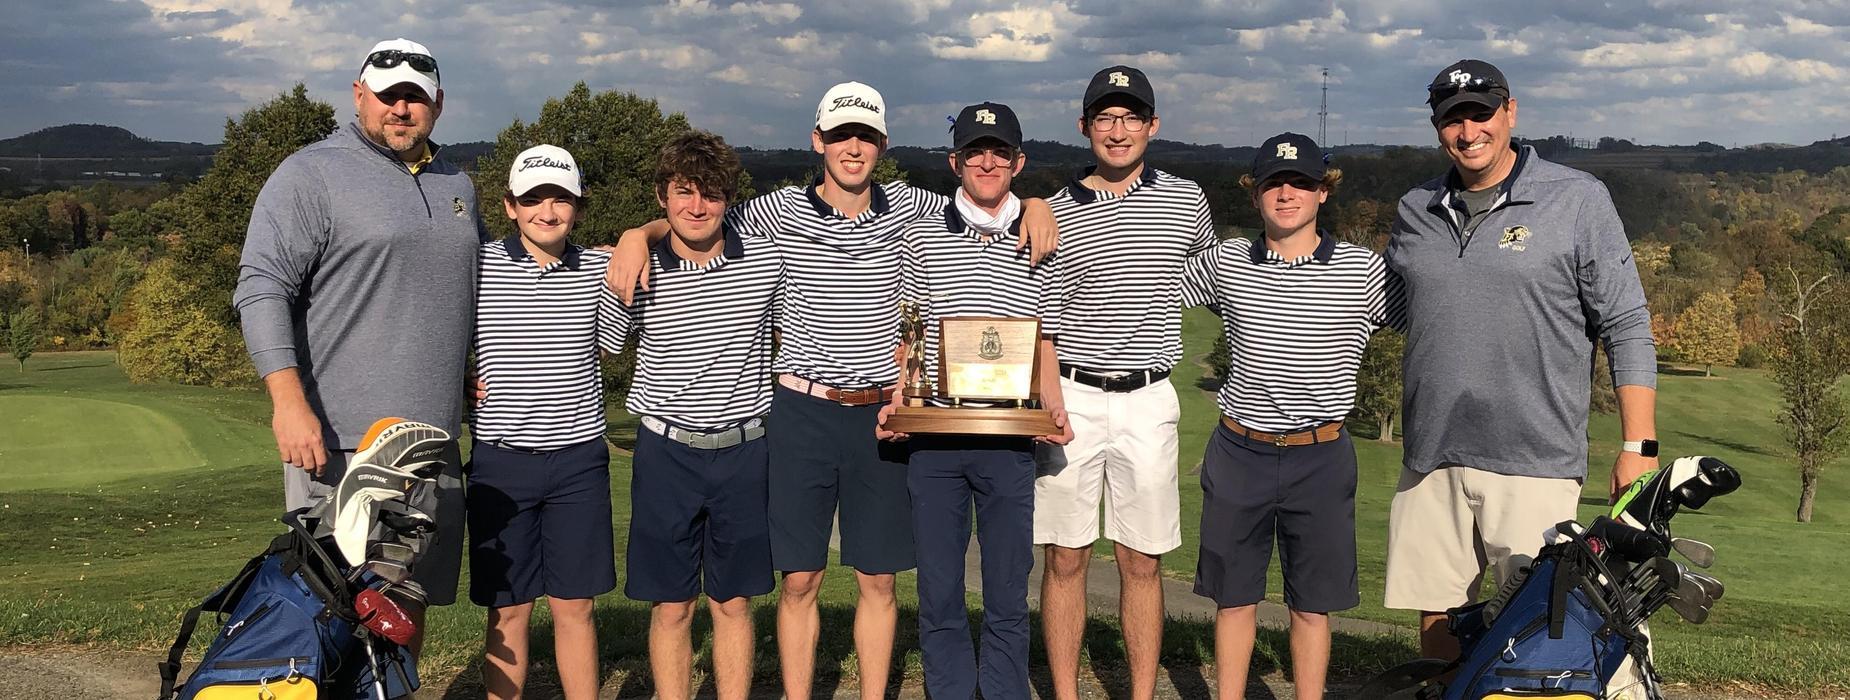 WPIAL Golf Champions